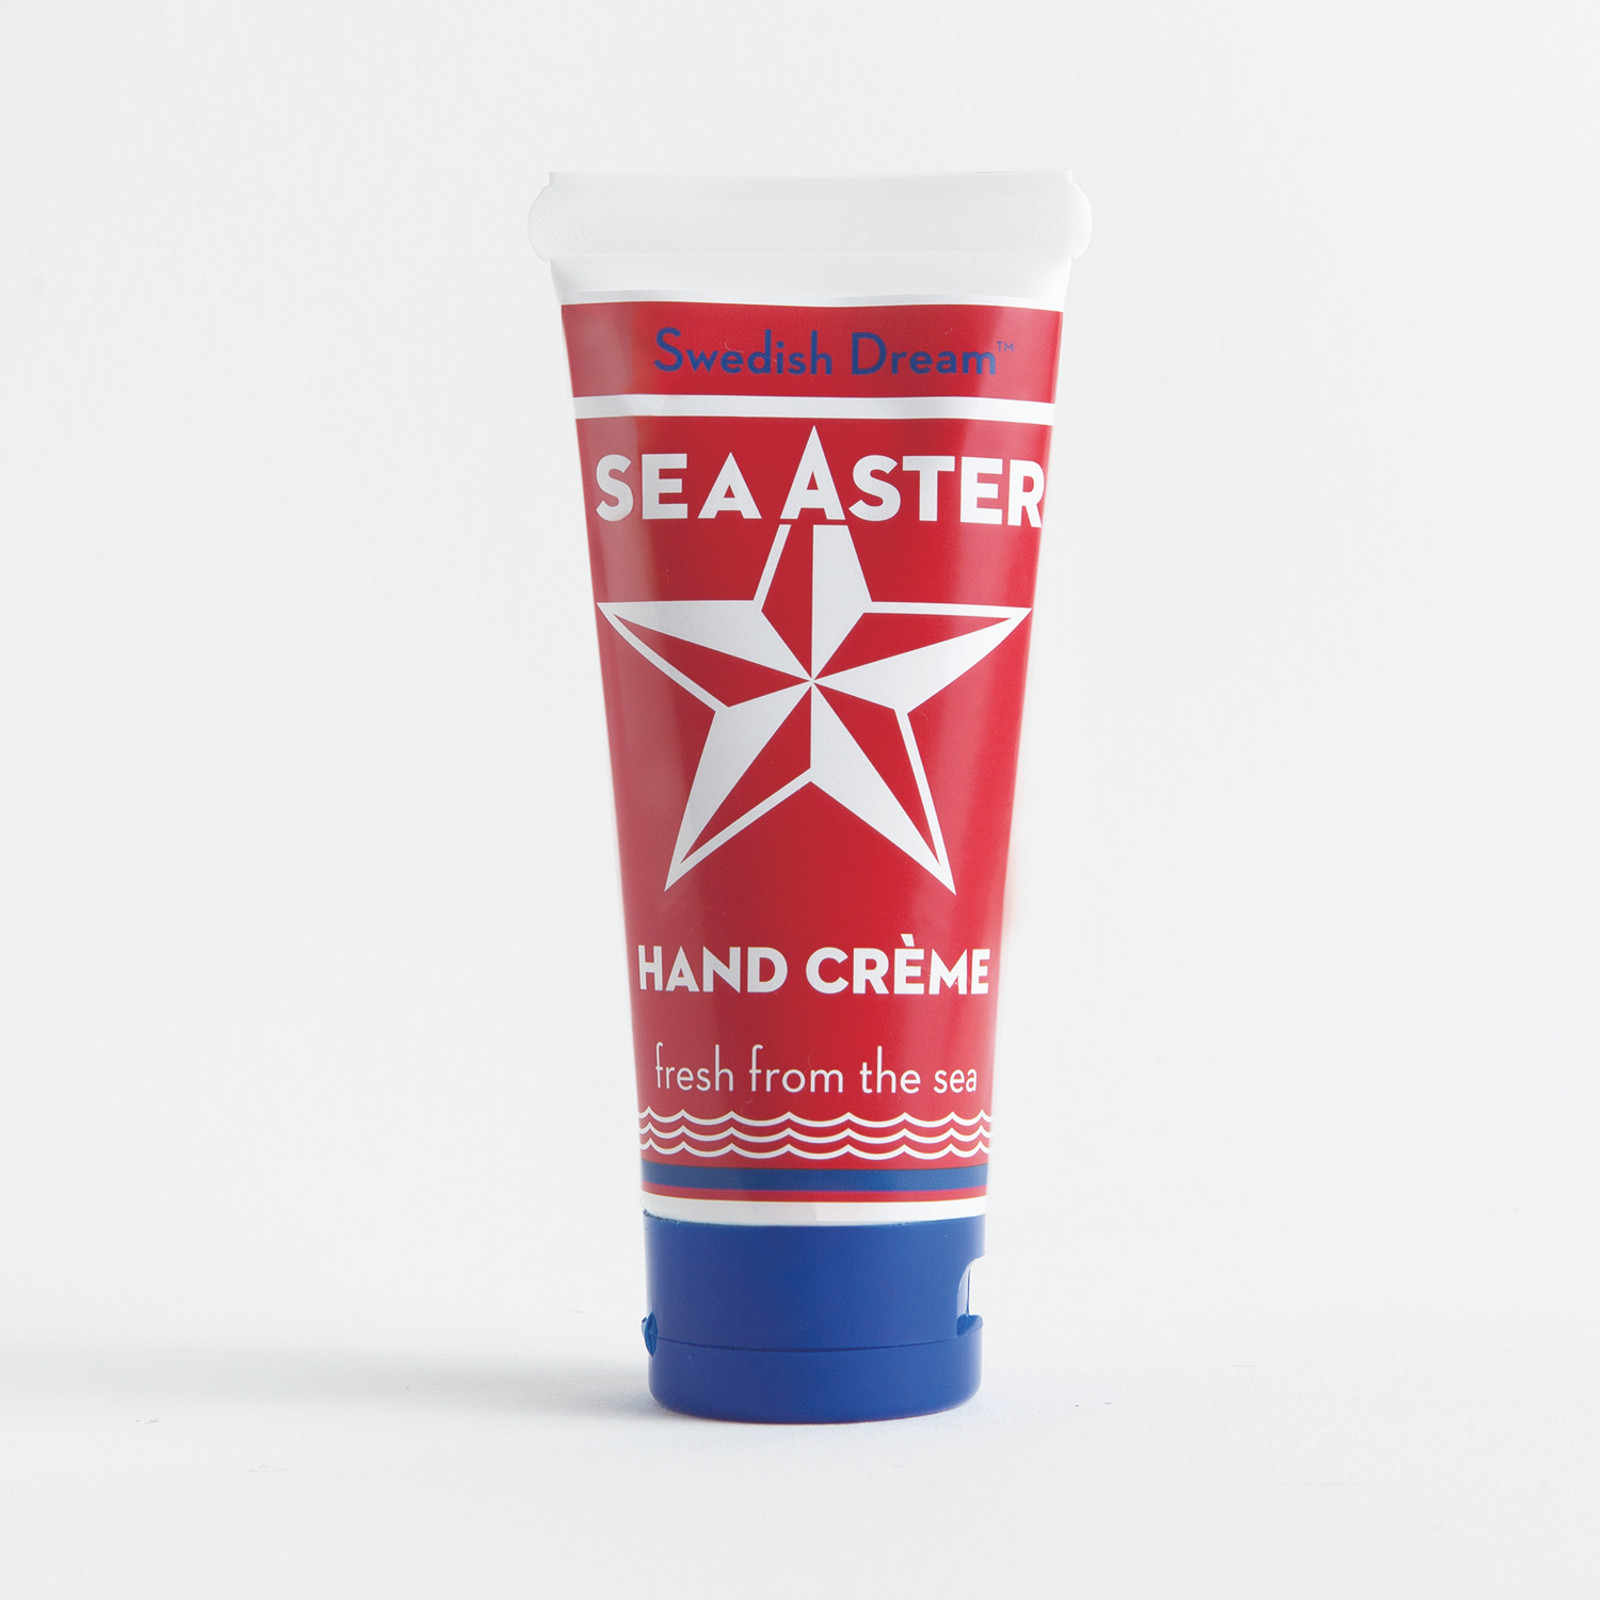 Swedish Dream Sea Aster Hand Creme, 3 oz. (KALA-591)